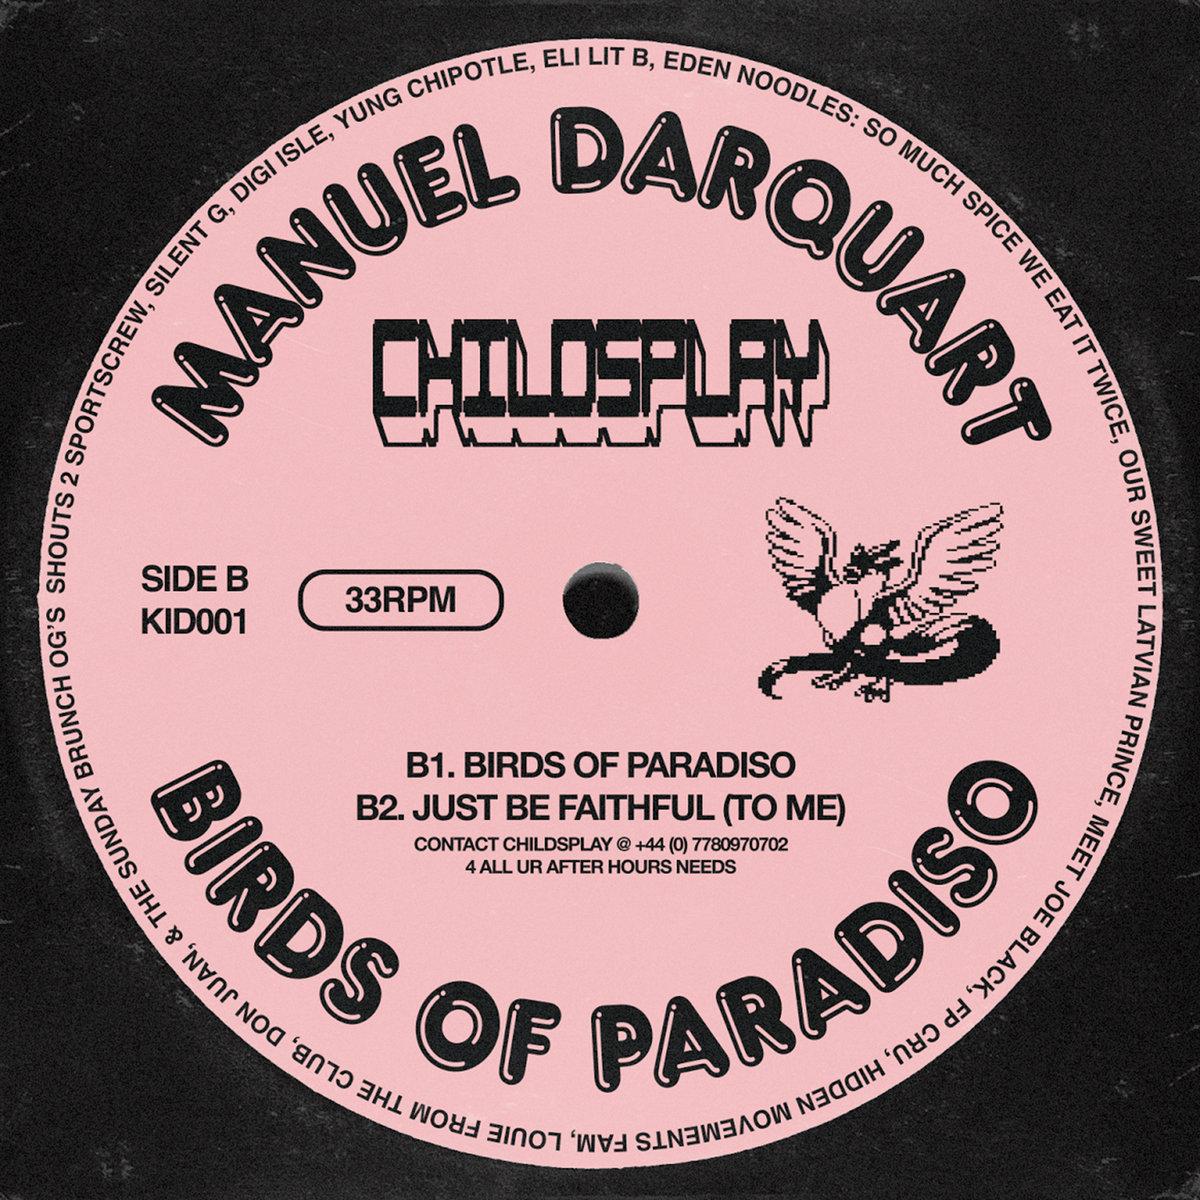 birds of paradiso | childsplay